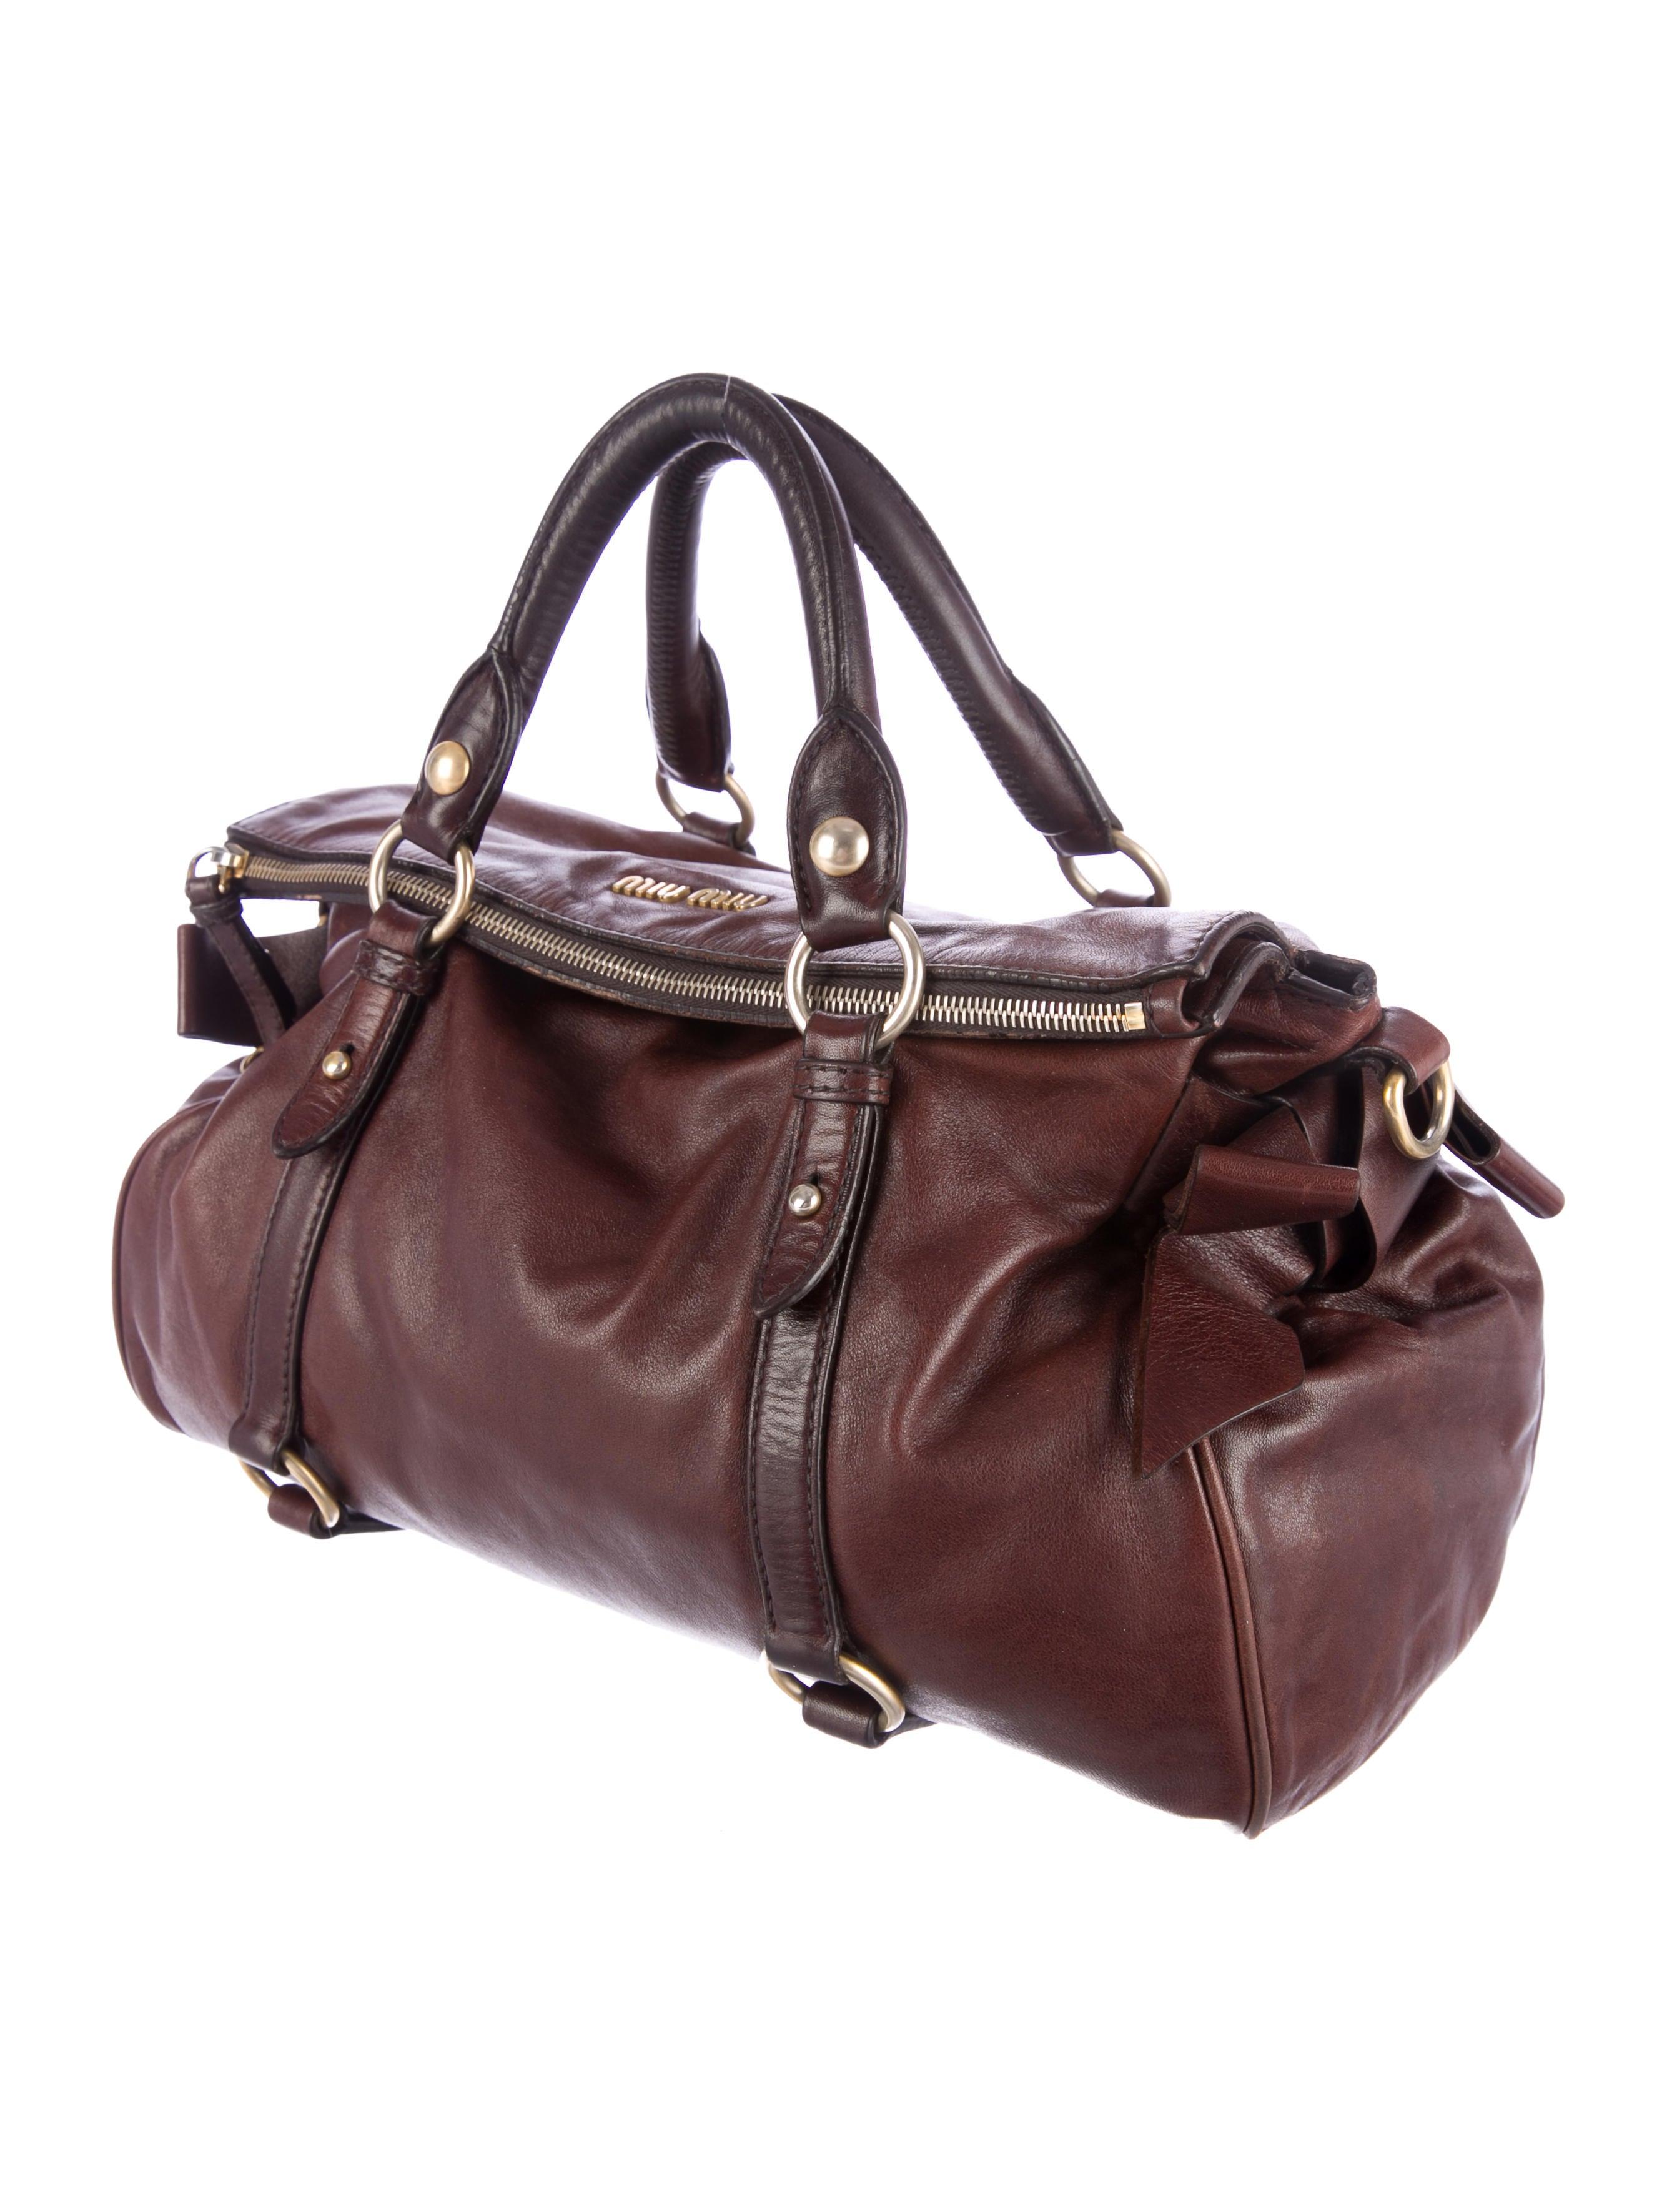 Miu Miu Leather Monk Satchel - Handbags - MIU34857 | The RealReal